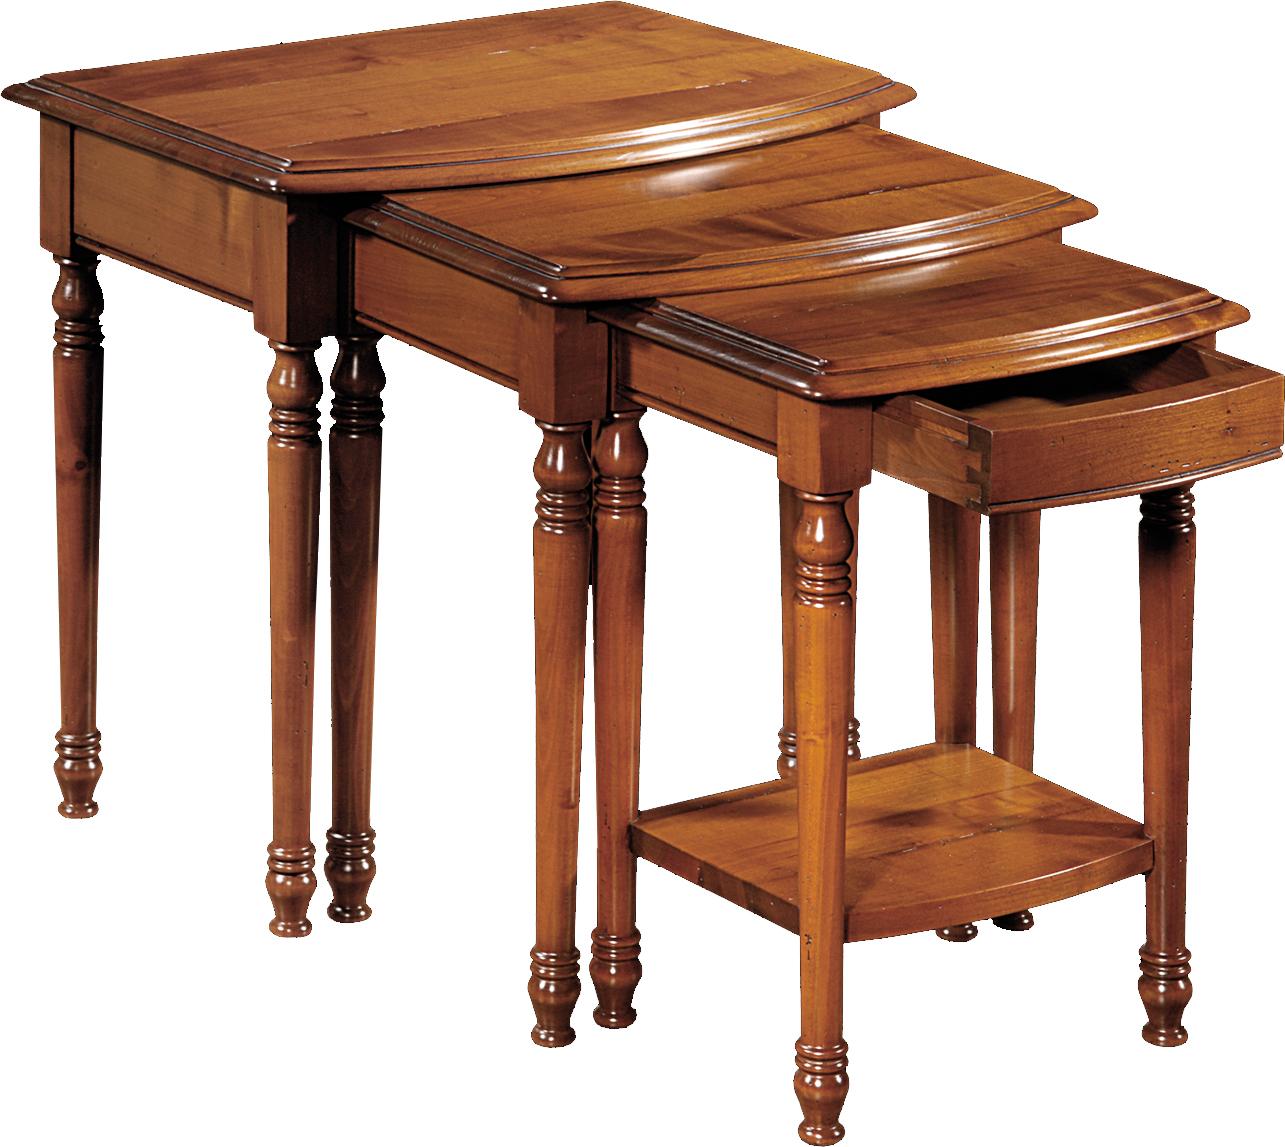 pied de table guide d 39 achat. Black Bedroom Furniture Sets. Home Design Ideas